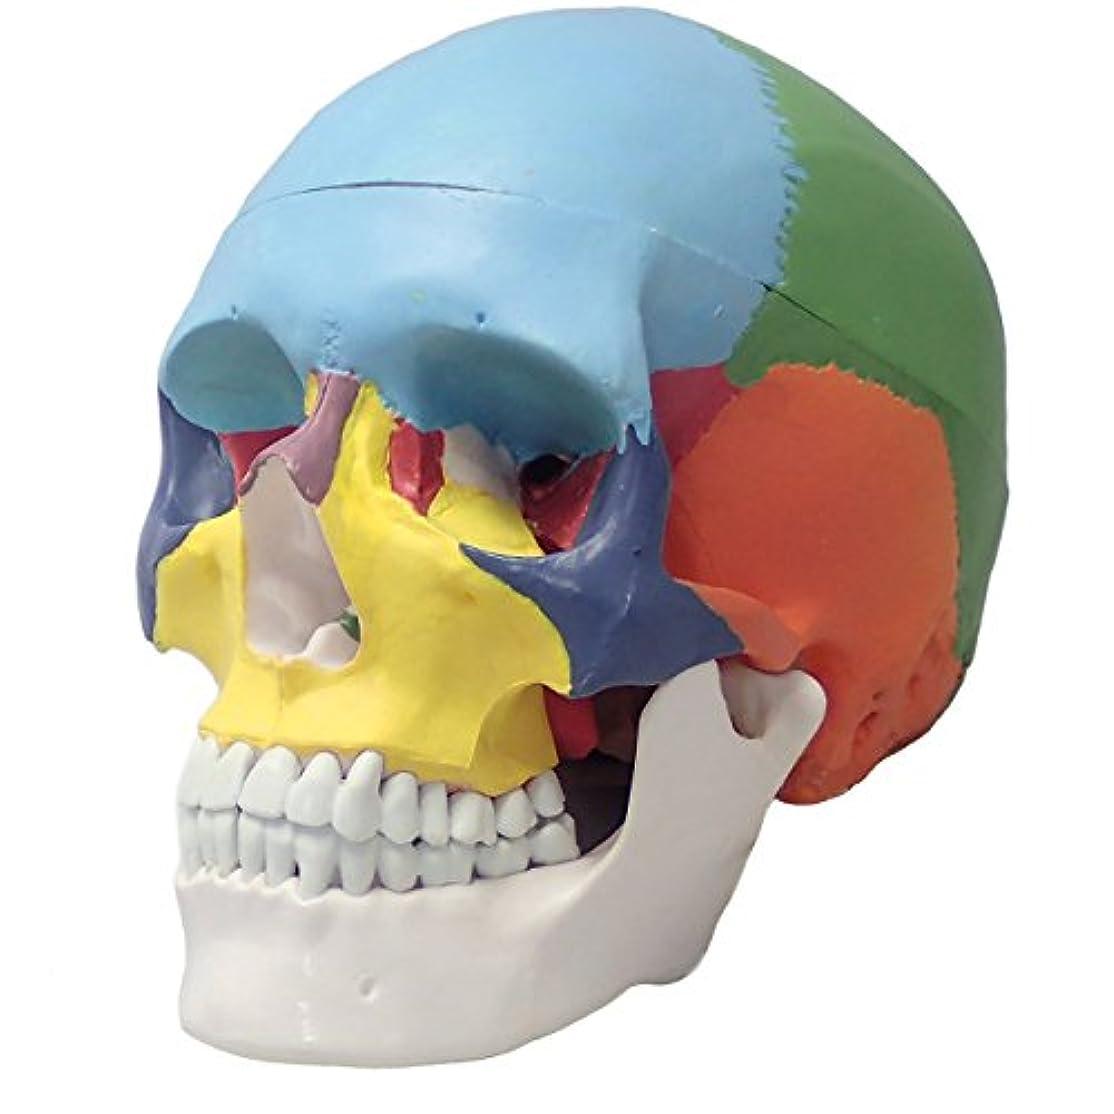 コンパニオン反乱経過[Fellezza] 頭蓋骨 可動式頭蓋模型 歯模型 骨格 分解可能 実物大